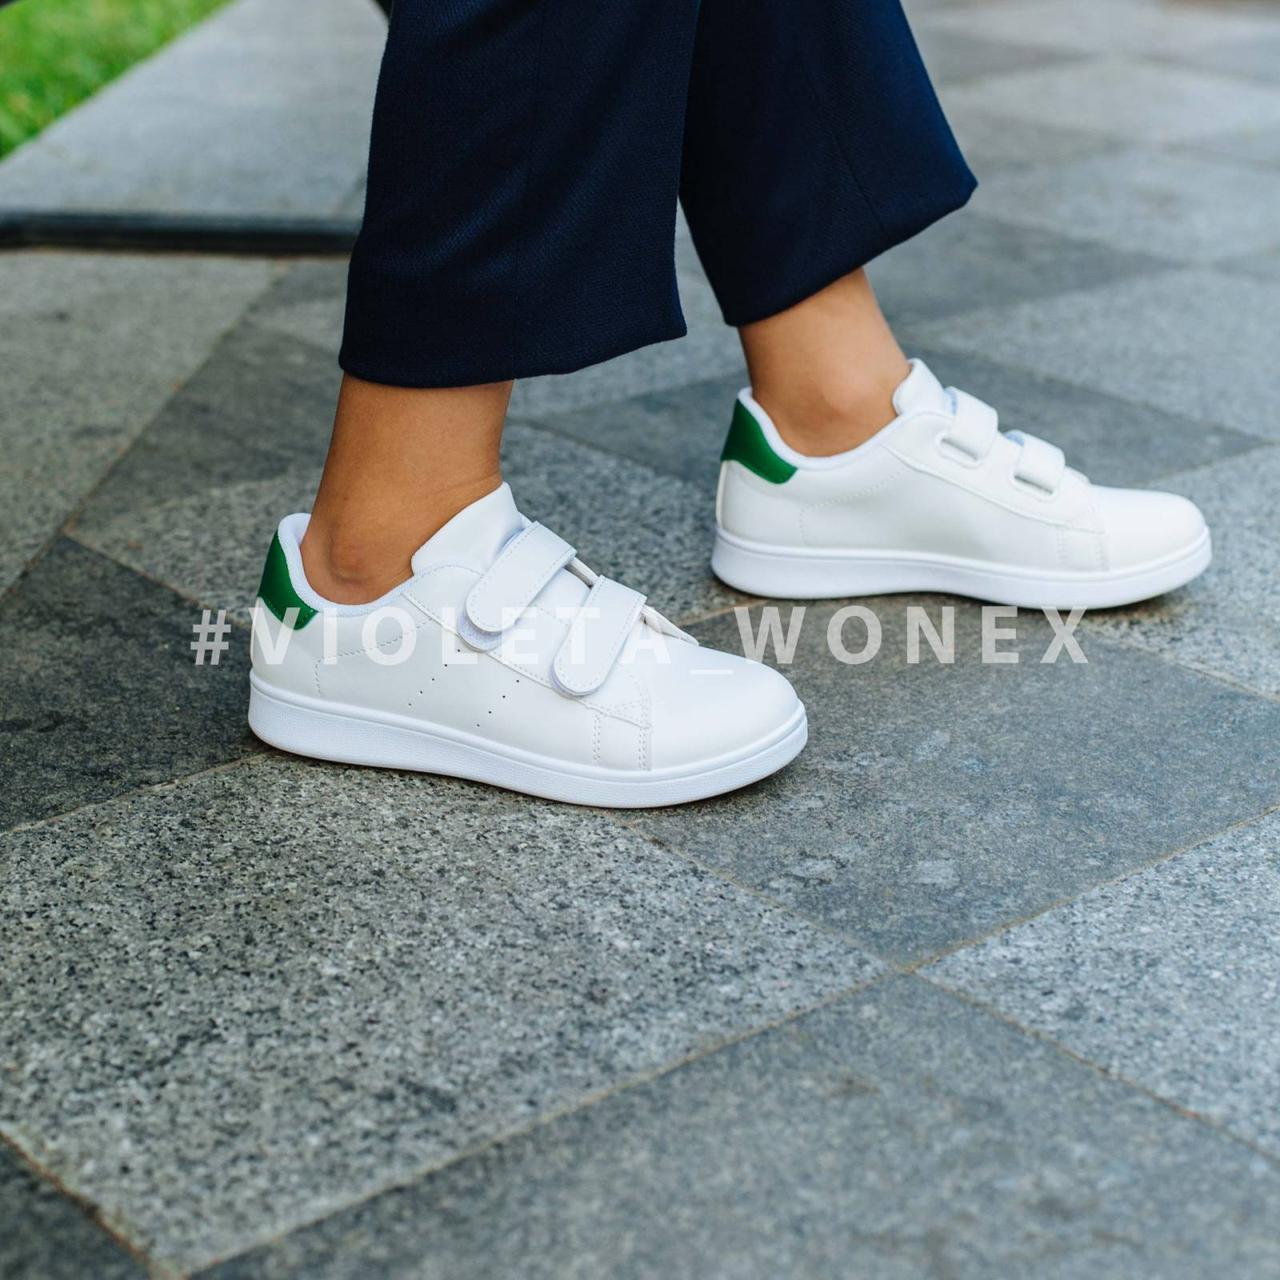 Кеды детские Violeta-Wonex 220-4 white-green